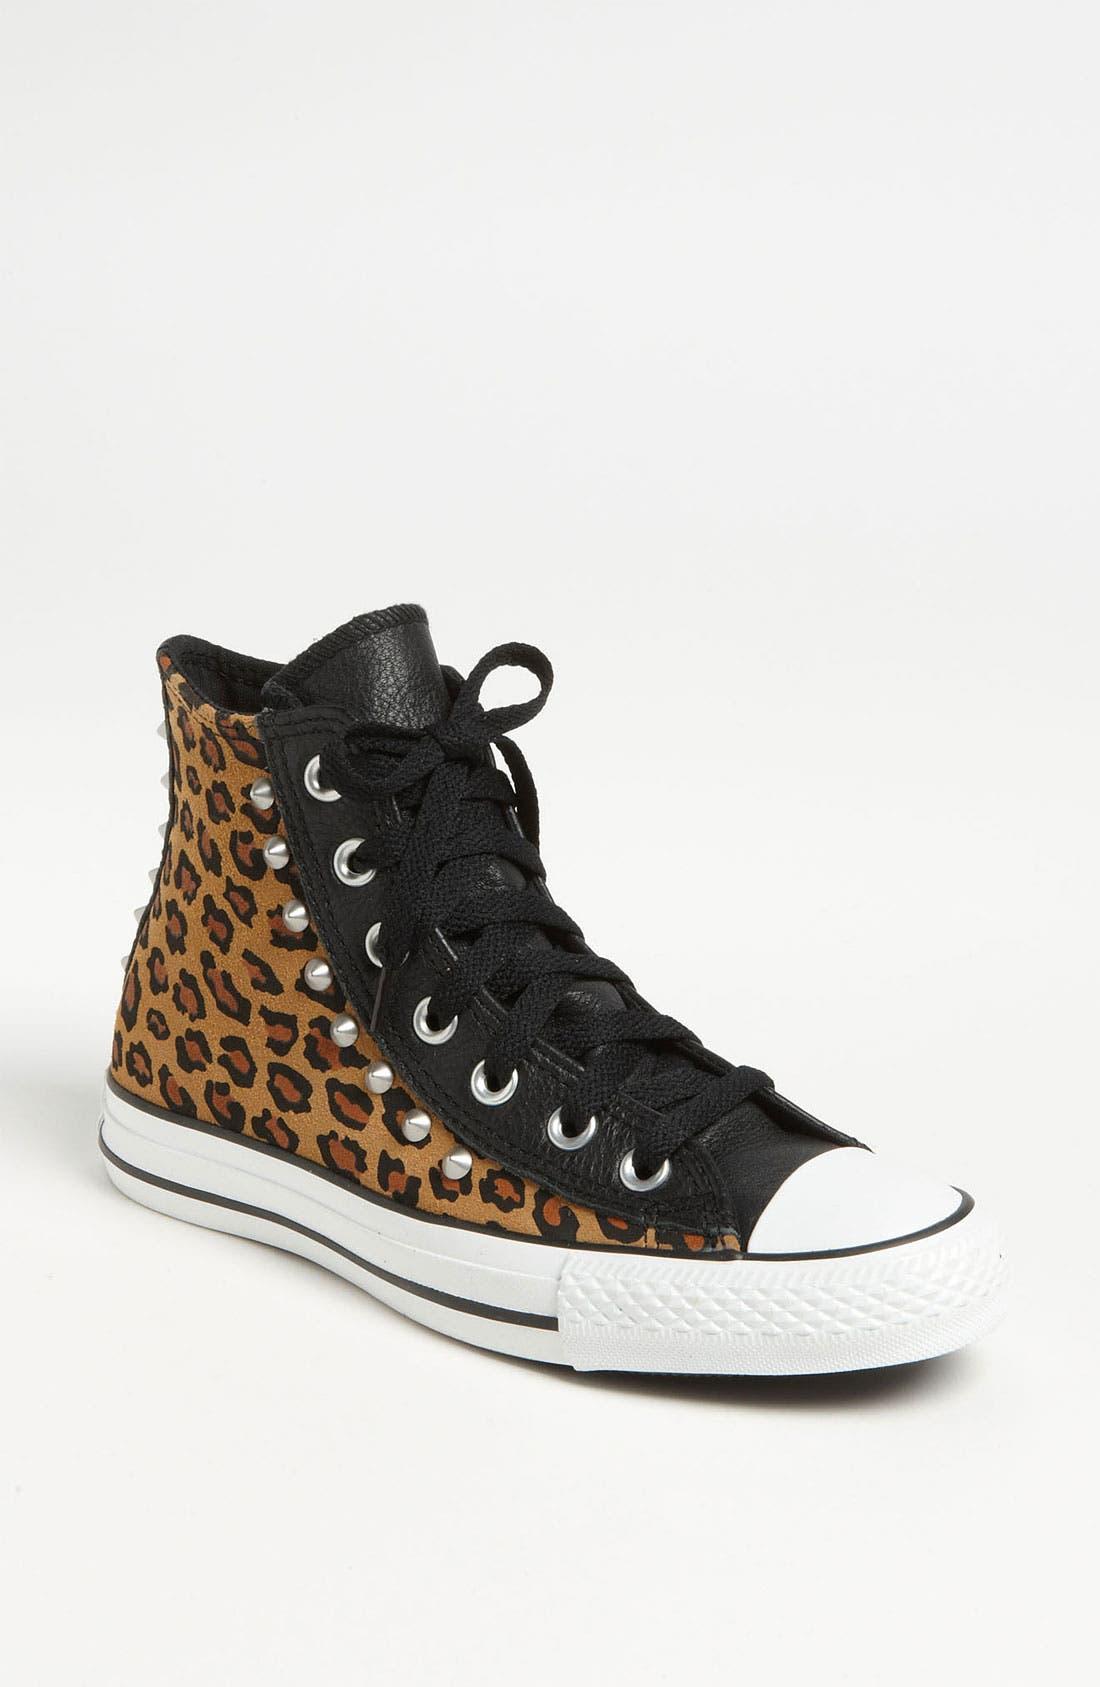 Main Image - Converse Chuck Taylor® All Star® Leopard Stud High Top Sneaker